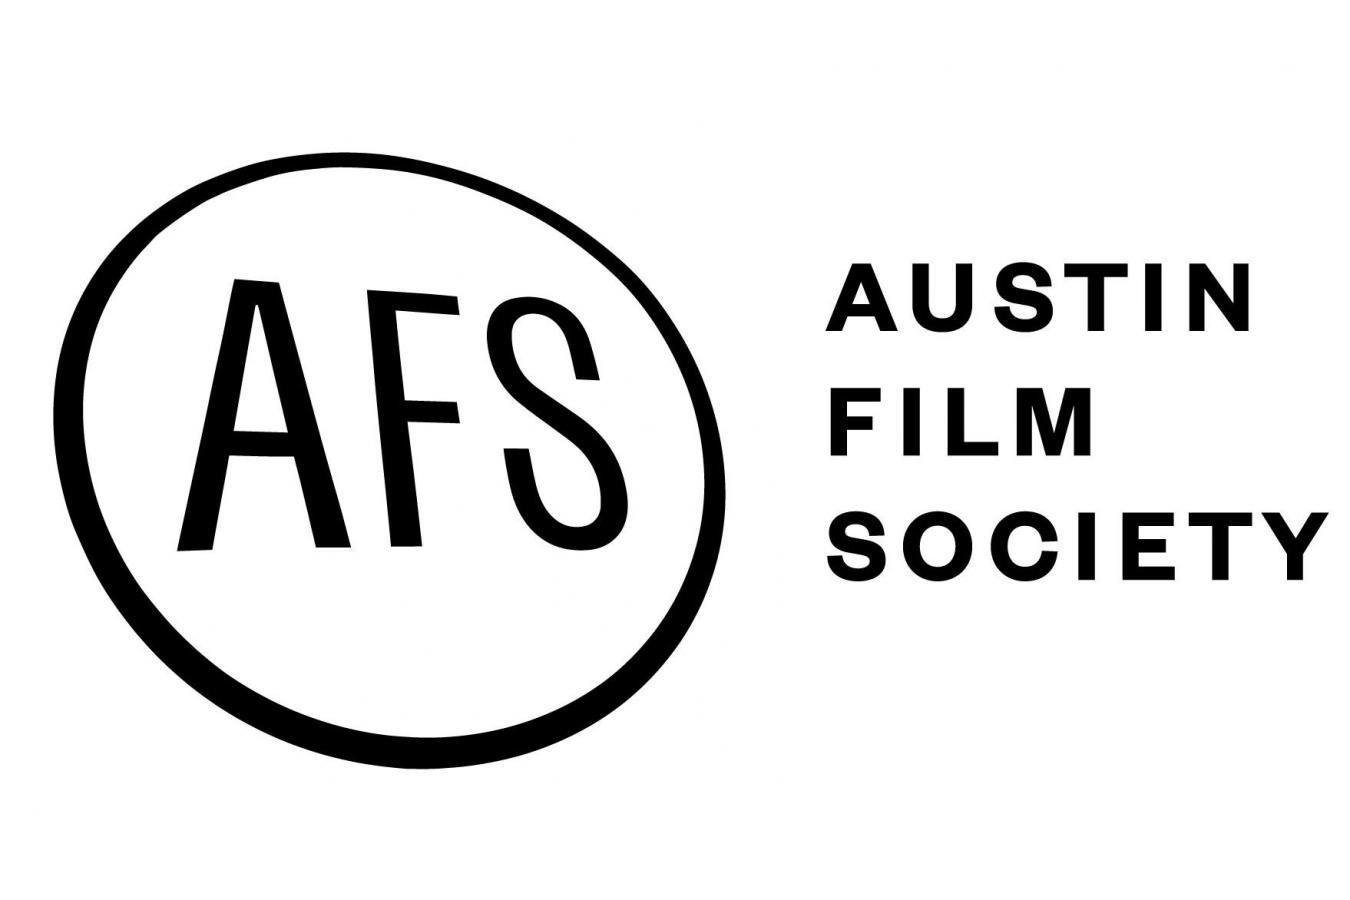 Austin Film Society Announces 2016 Grants: Program gives